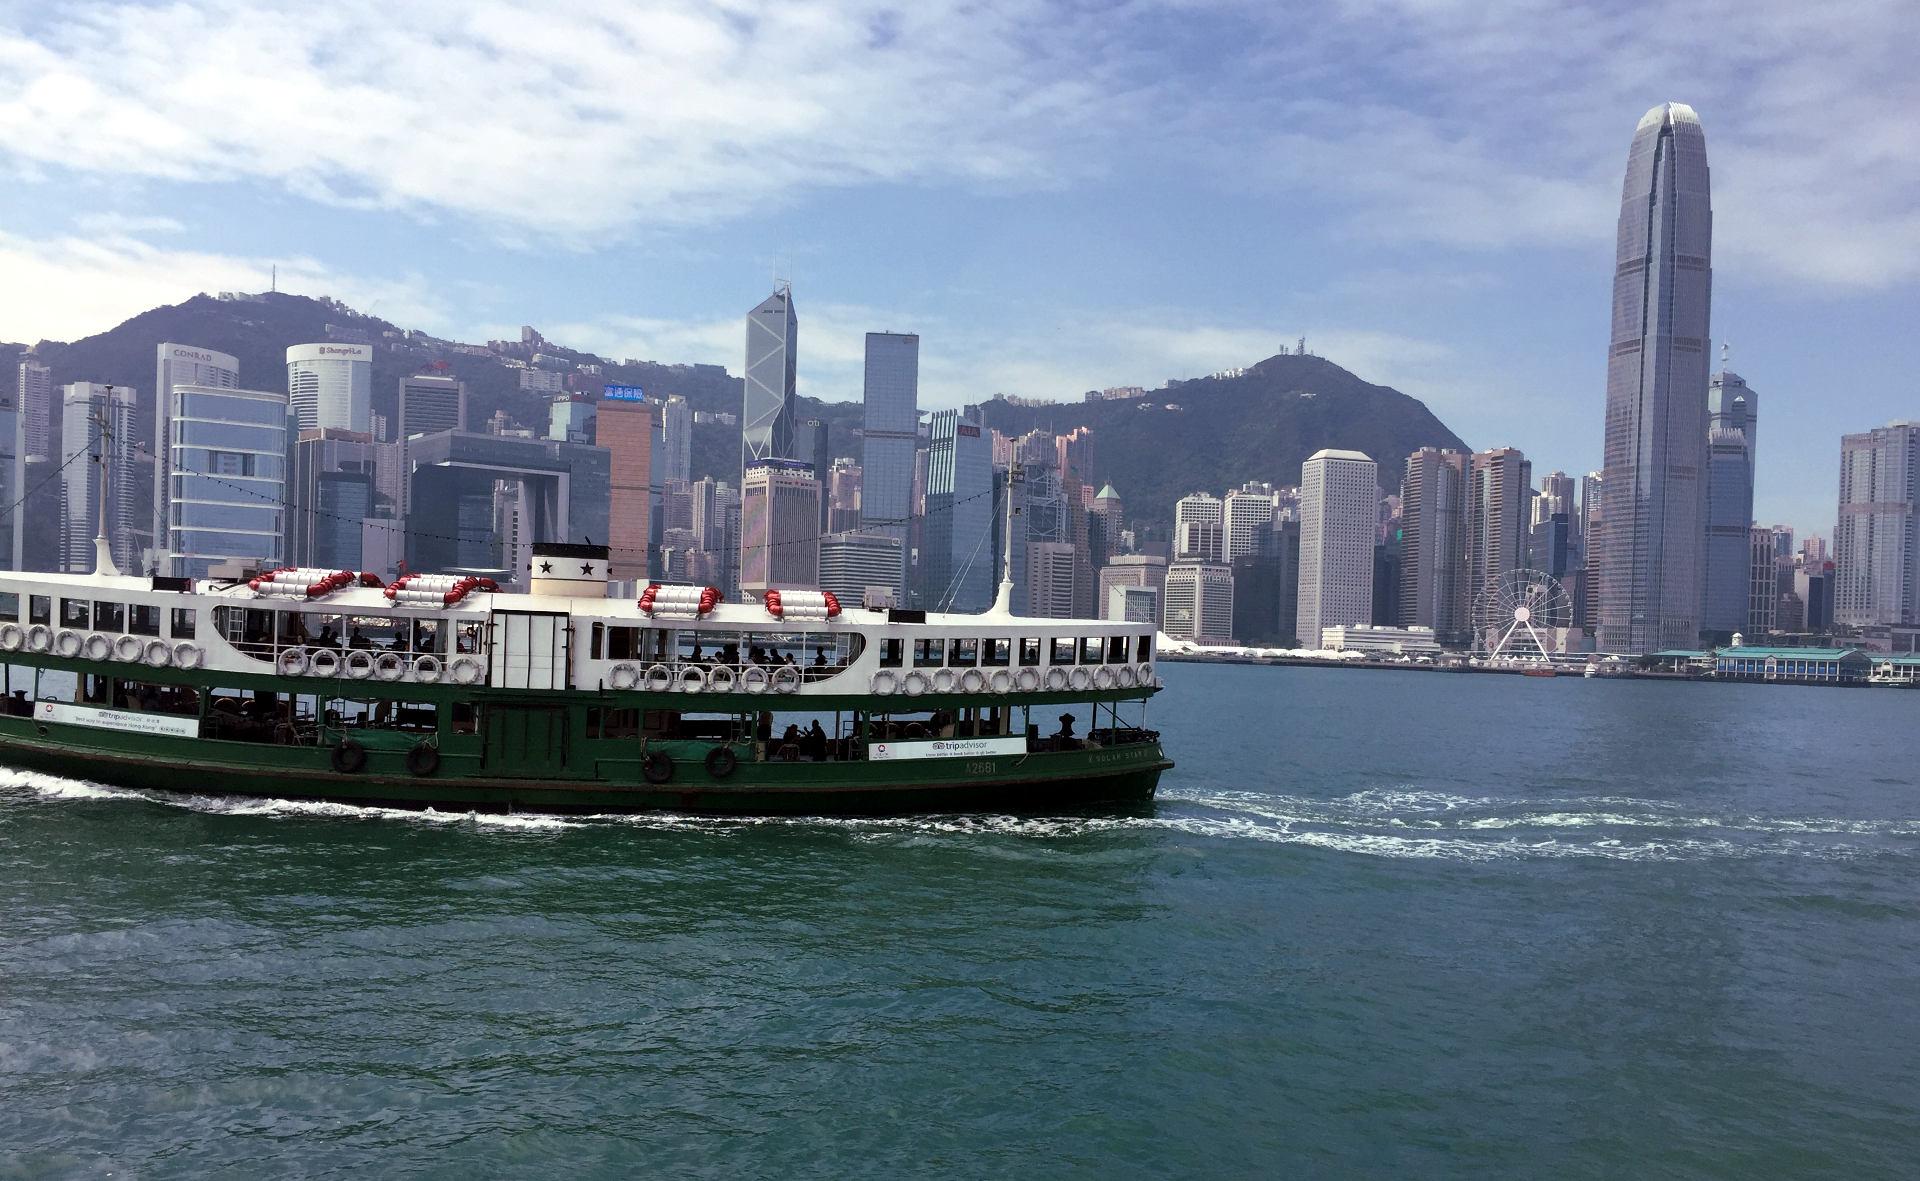 hongkong miasto statek iglawpodrozy